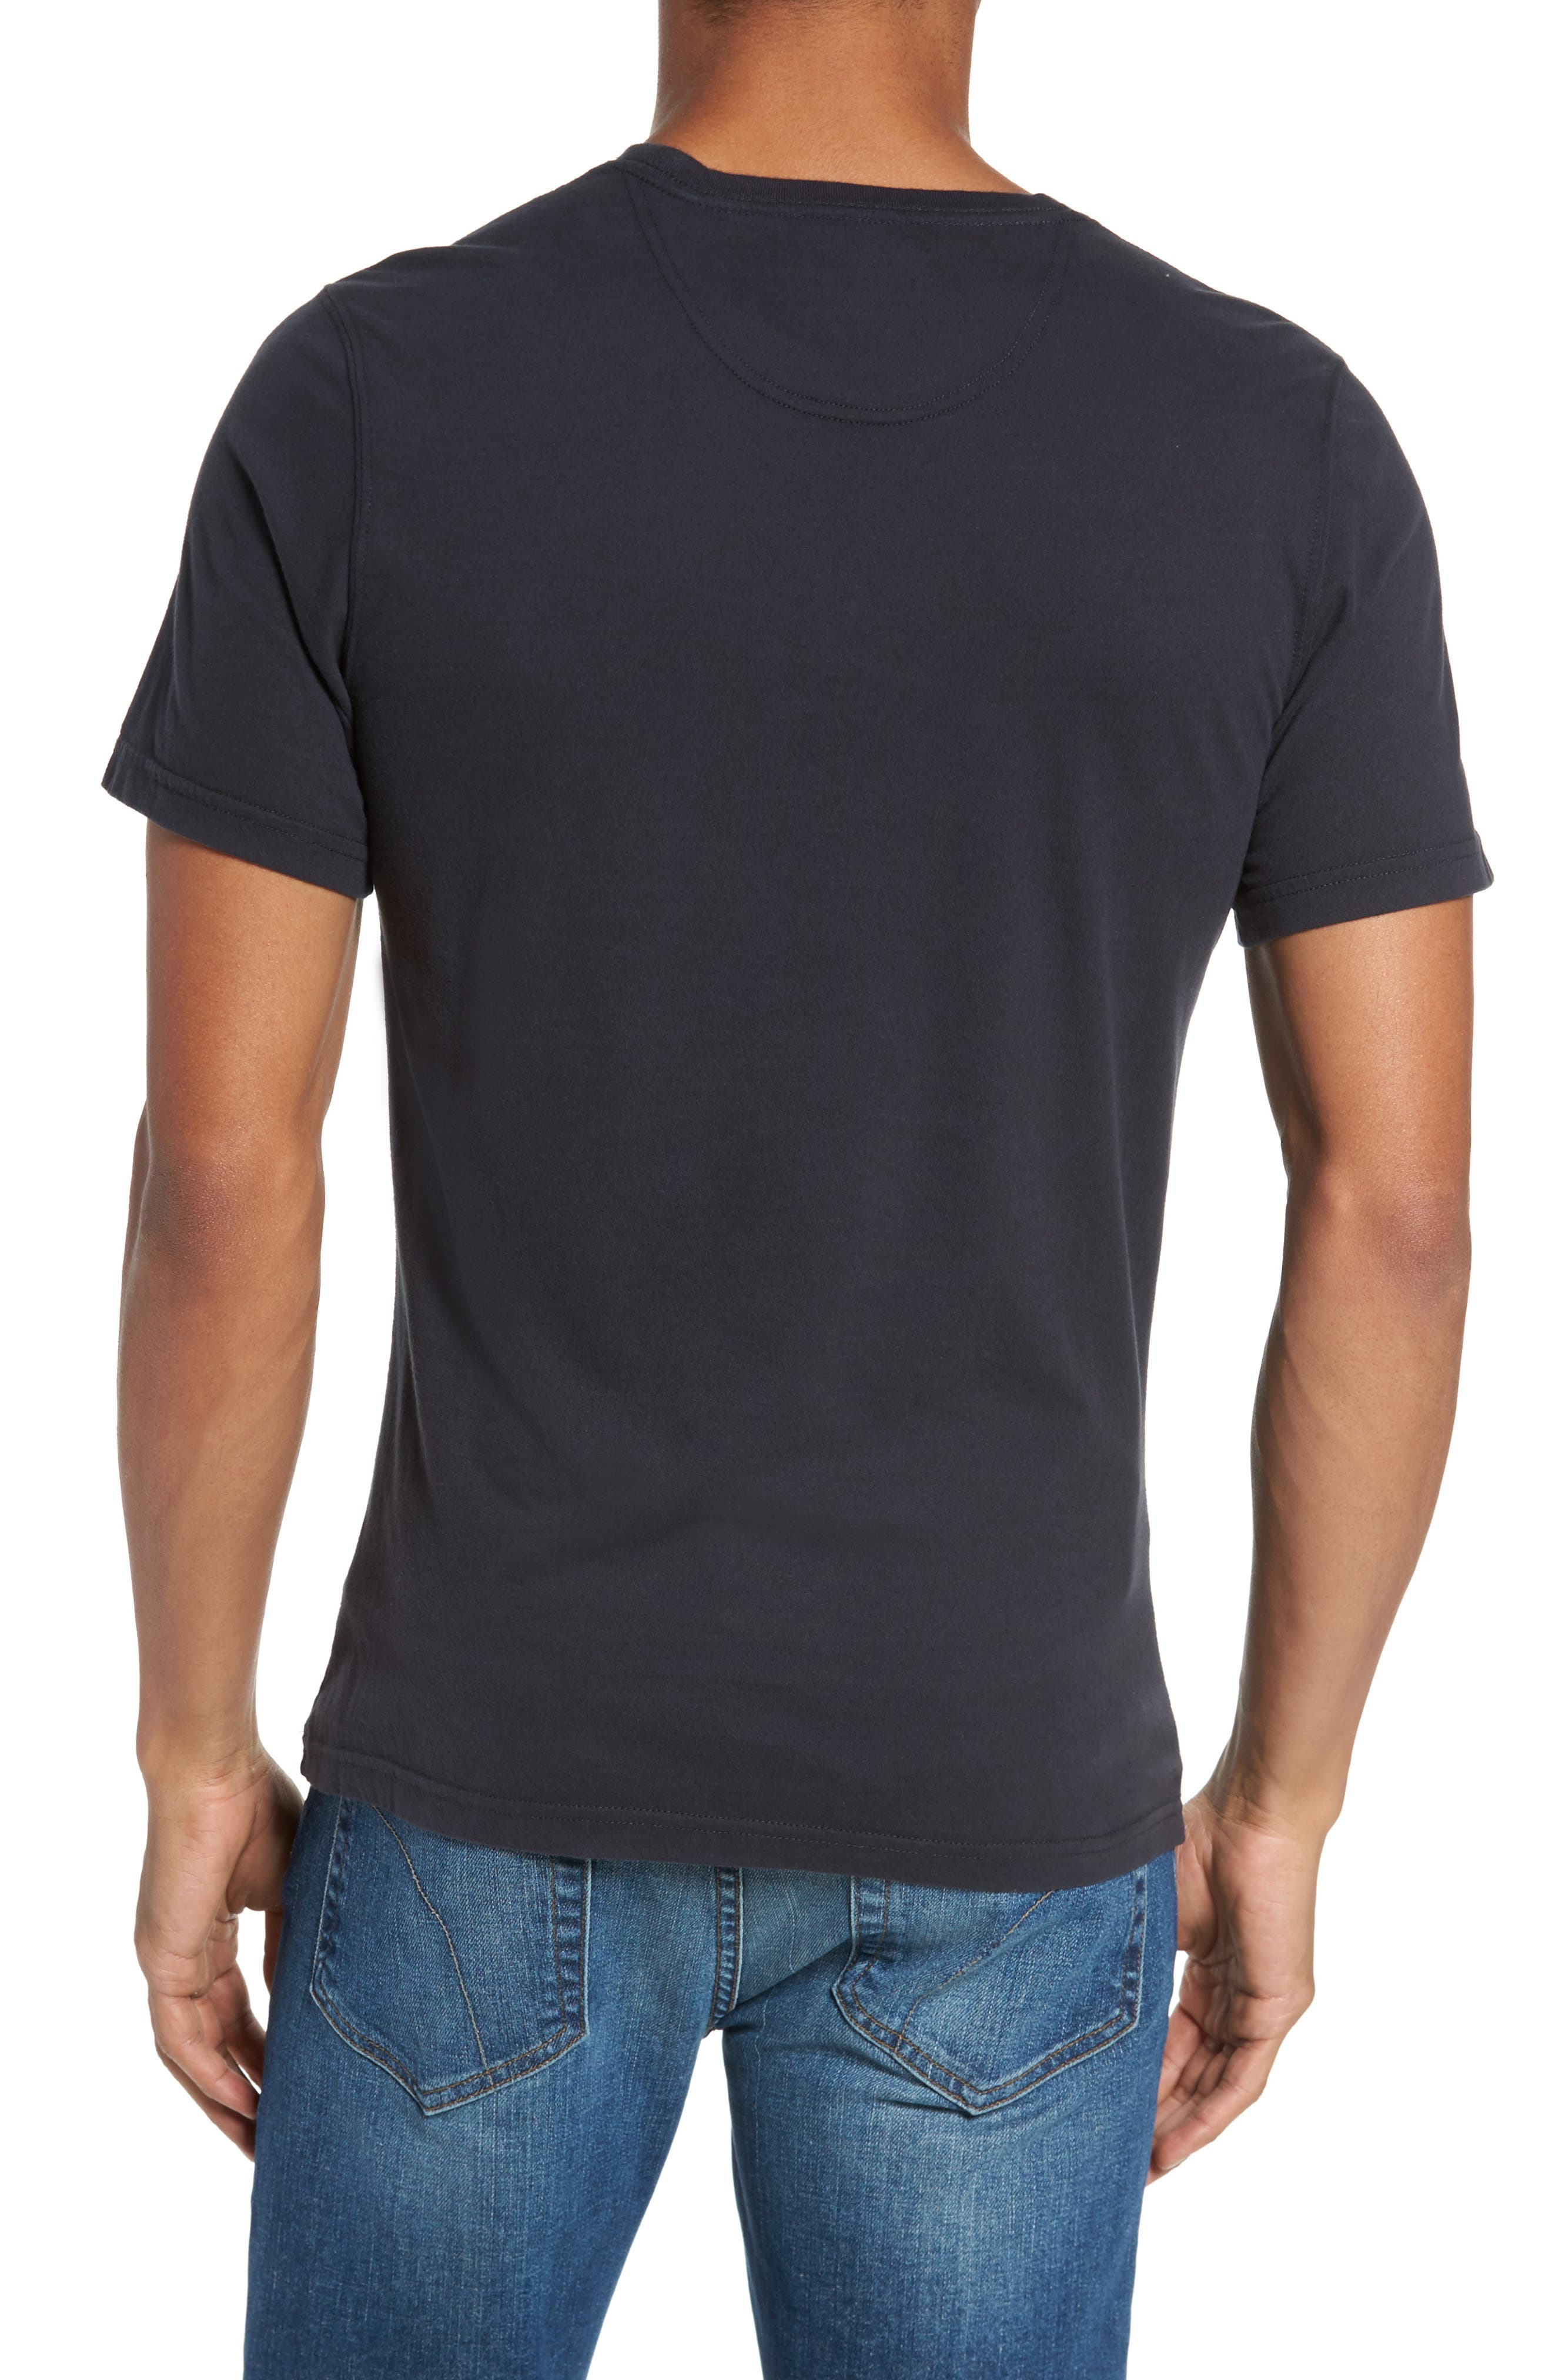 Alternate Image 2  - Barbour Barbour International Pace T-Shirt